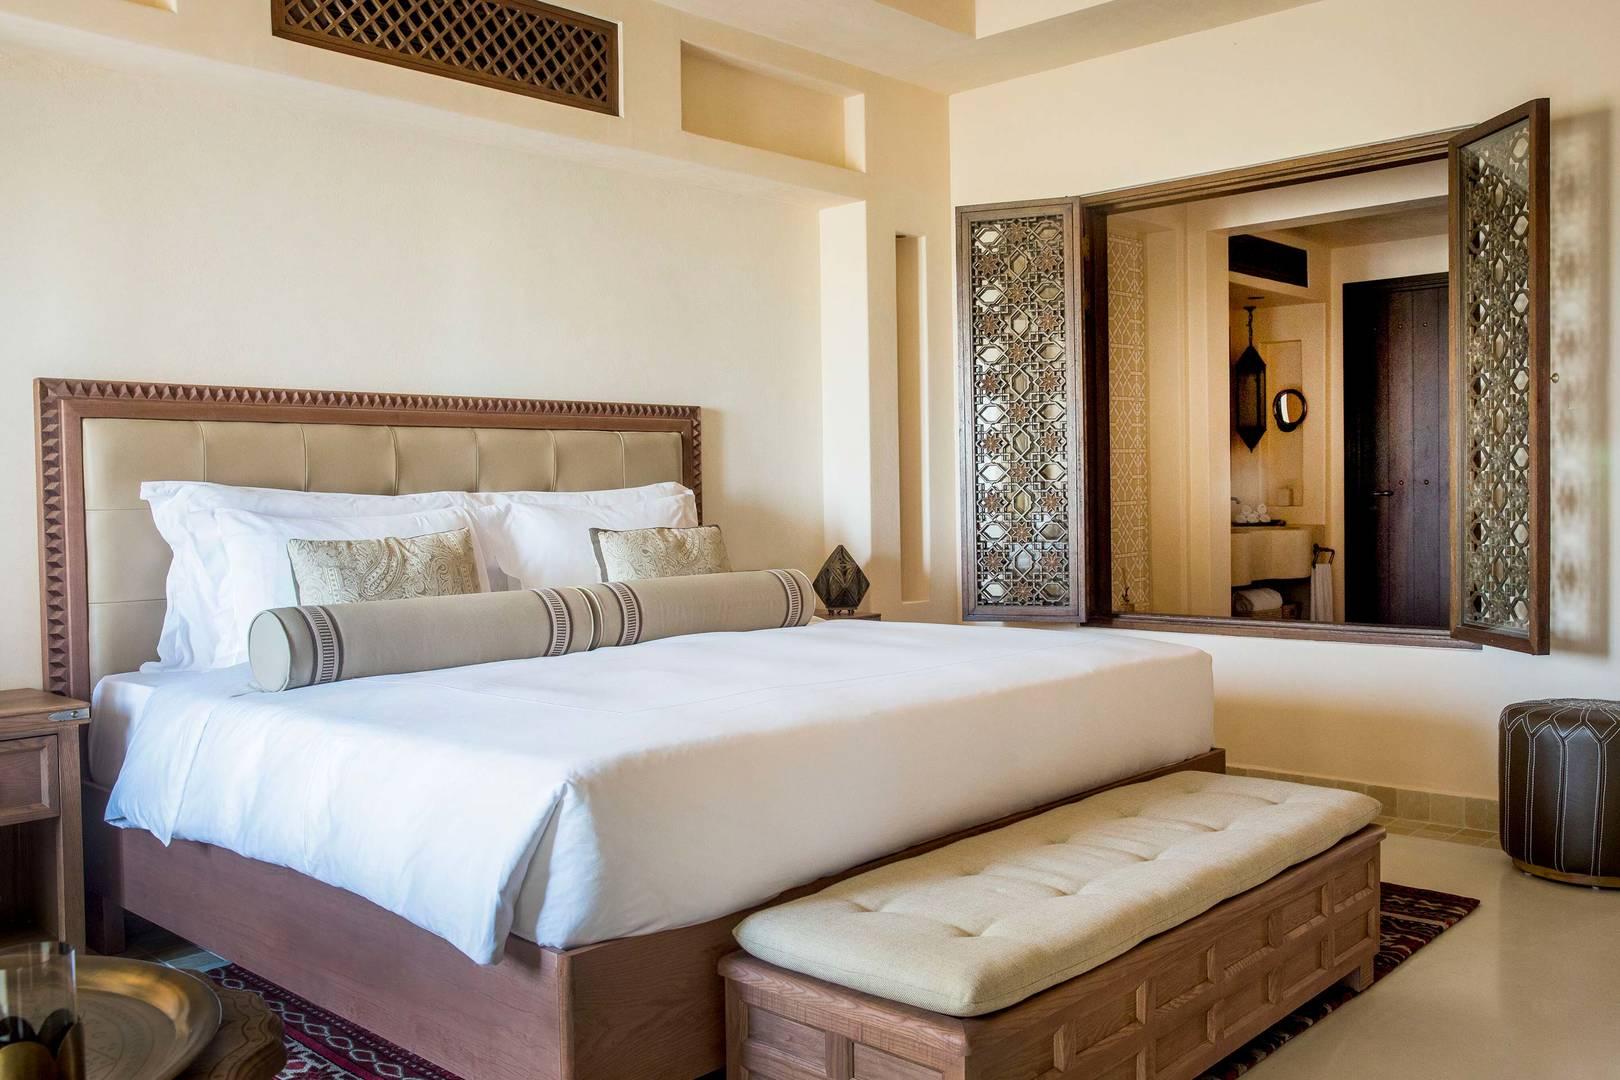 Arabian Deluxe Room Bedroom at Jumeirah Al Wathba Desert Resort & Spa